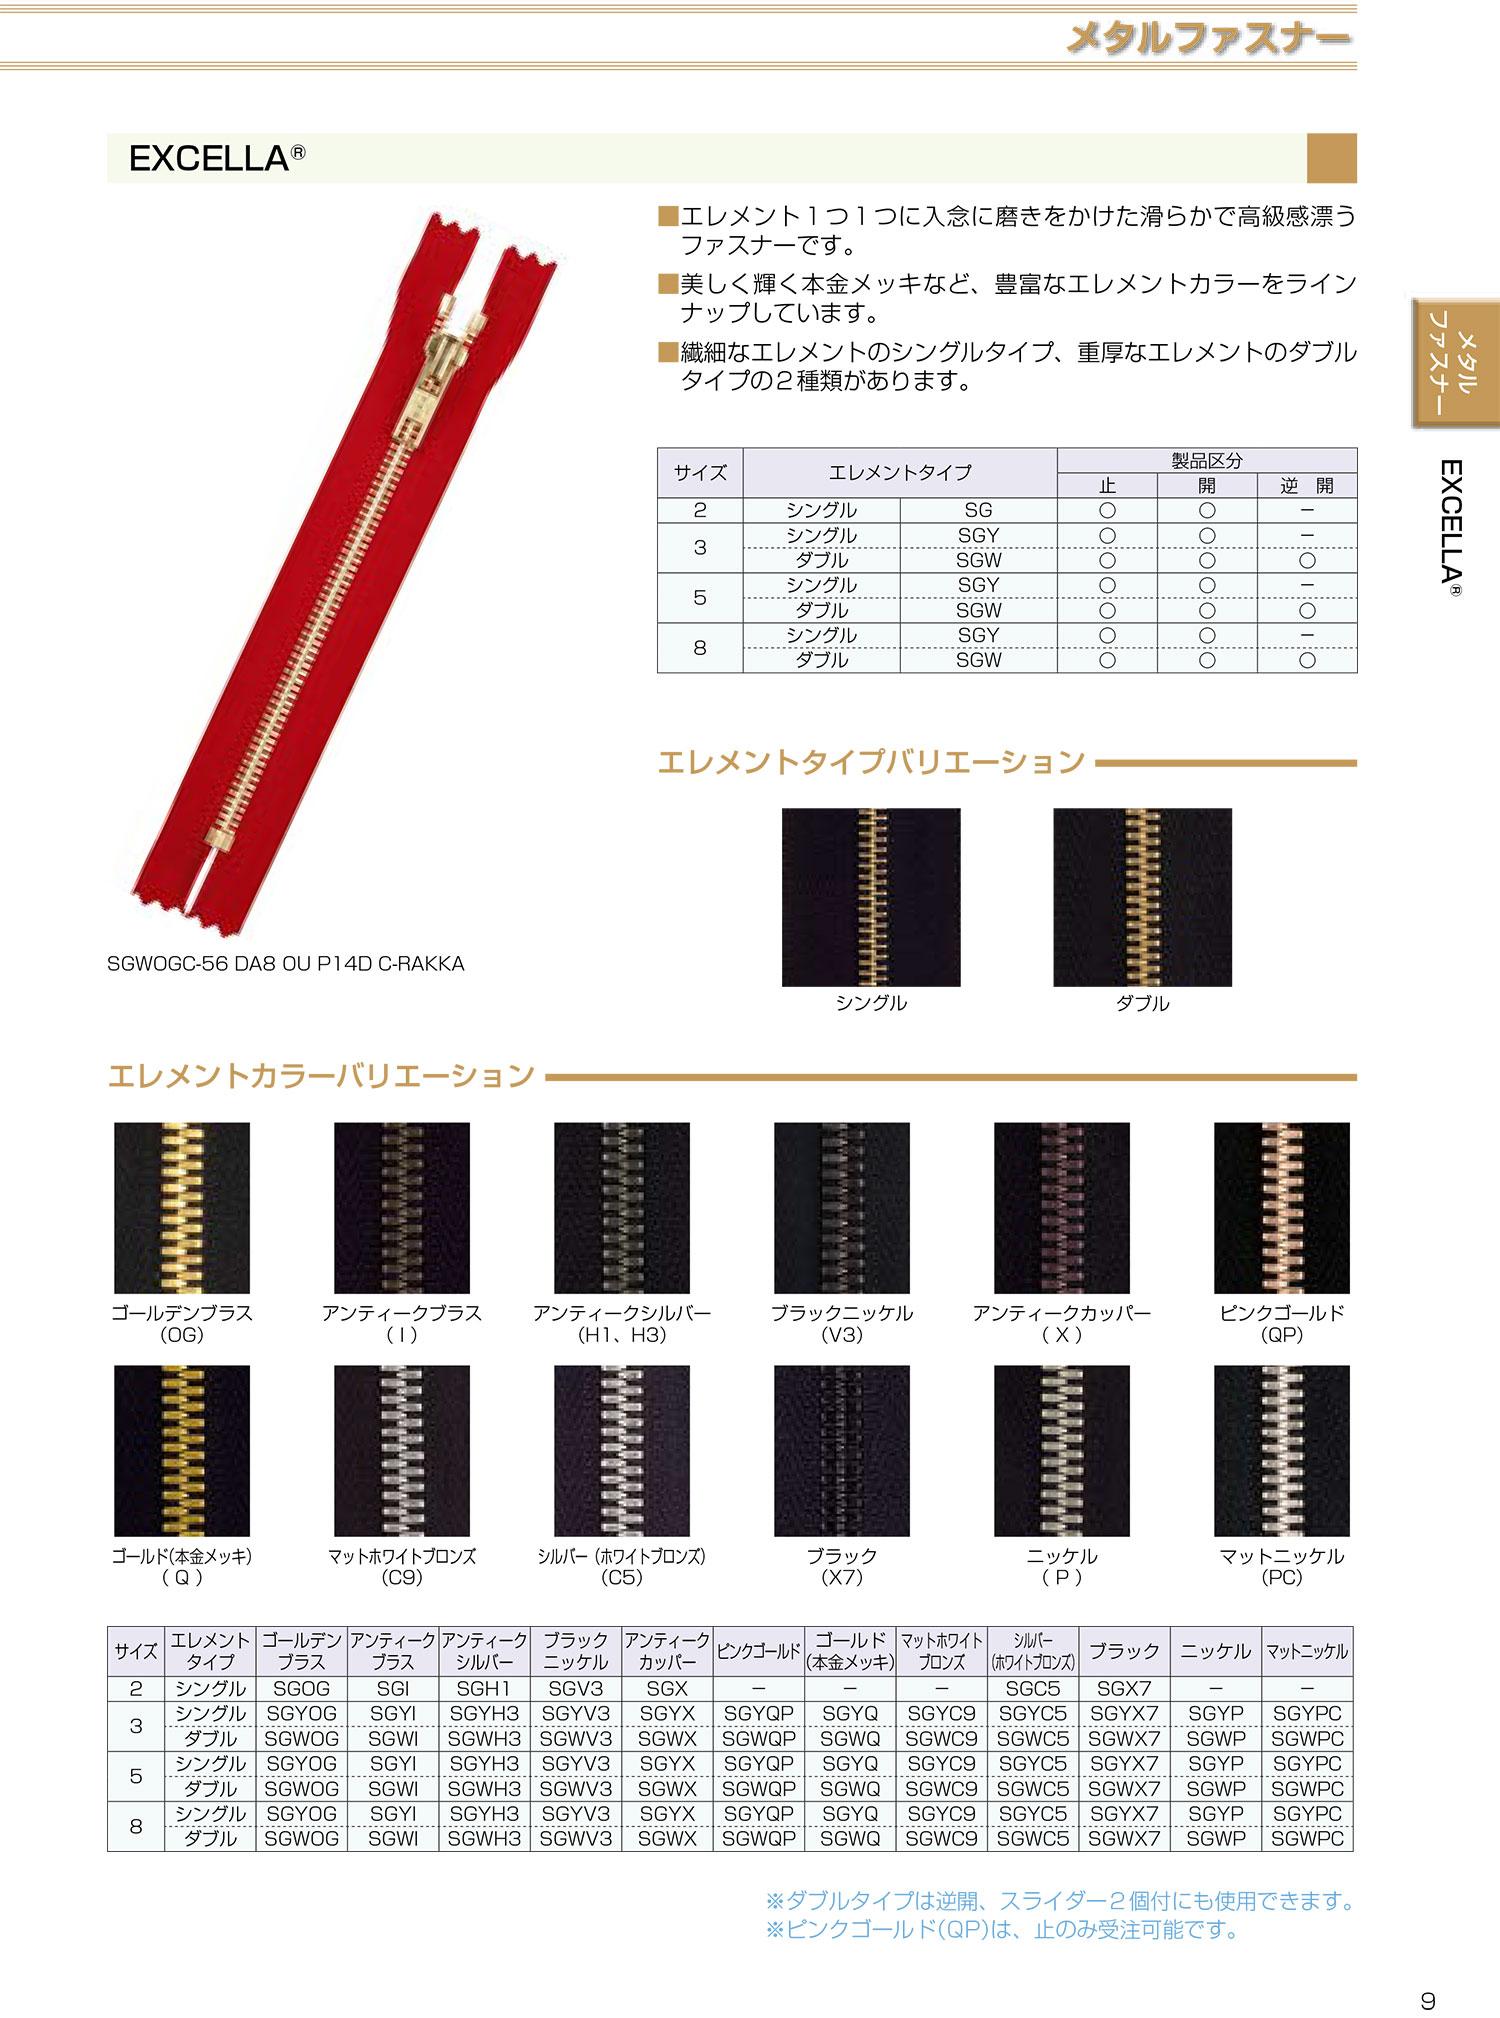 3SGYOGOR エクセラ 3サイズ ゴールデンブラス オープン シングル[ファスナー] YKK/オークラ商事 - ApparelX アパレル資材卸通販